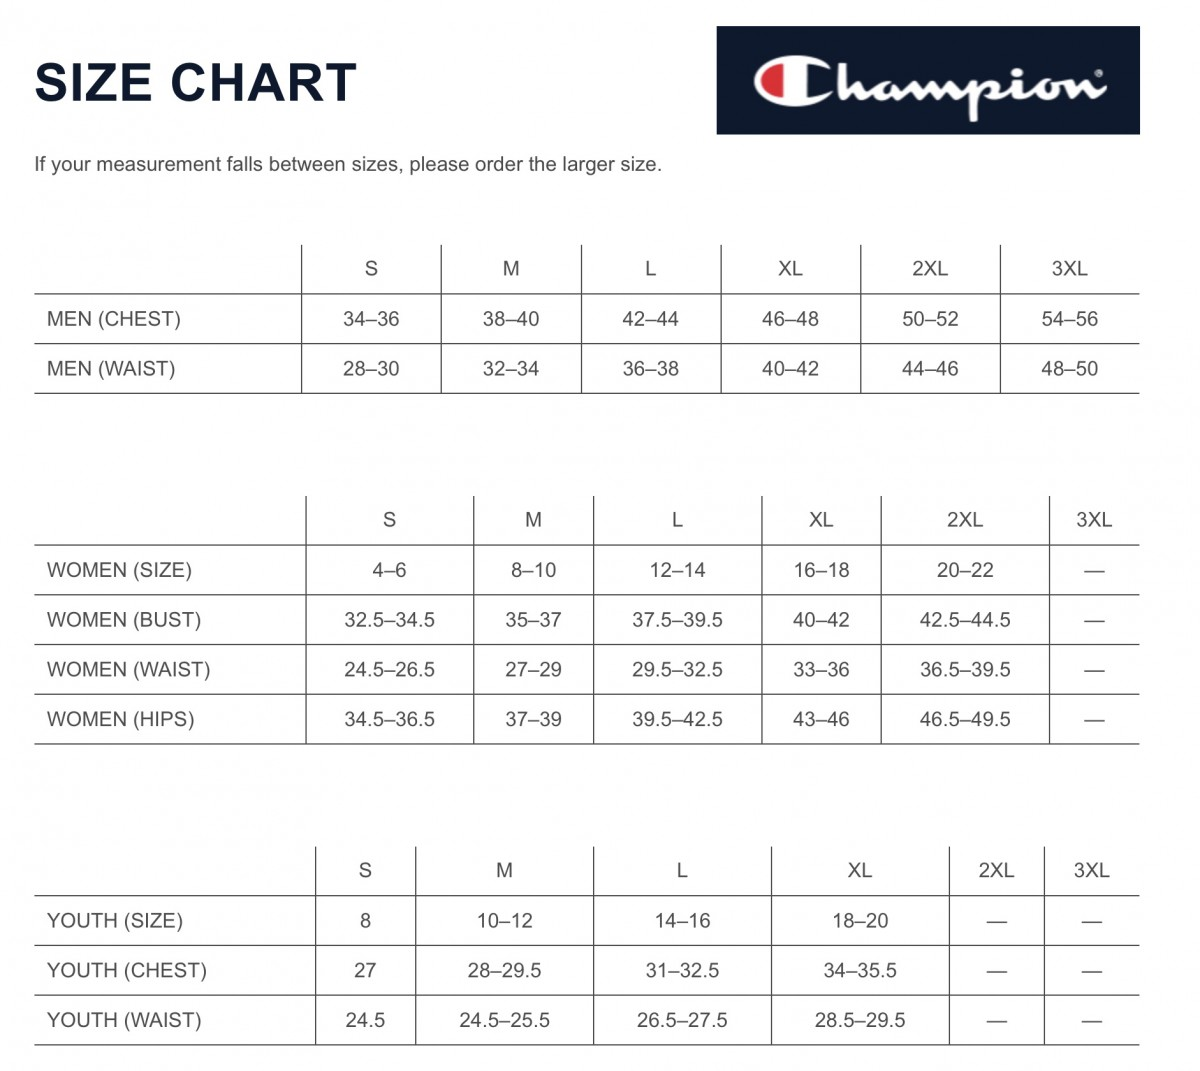 More Views Size Chart Champion Gtm